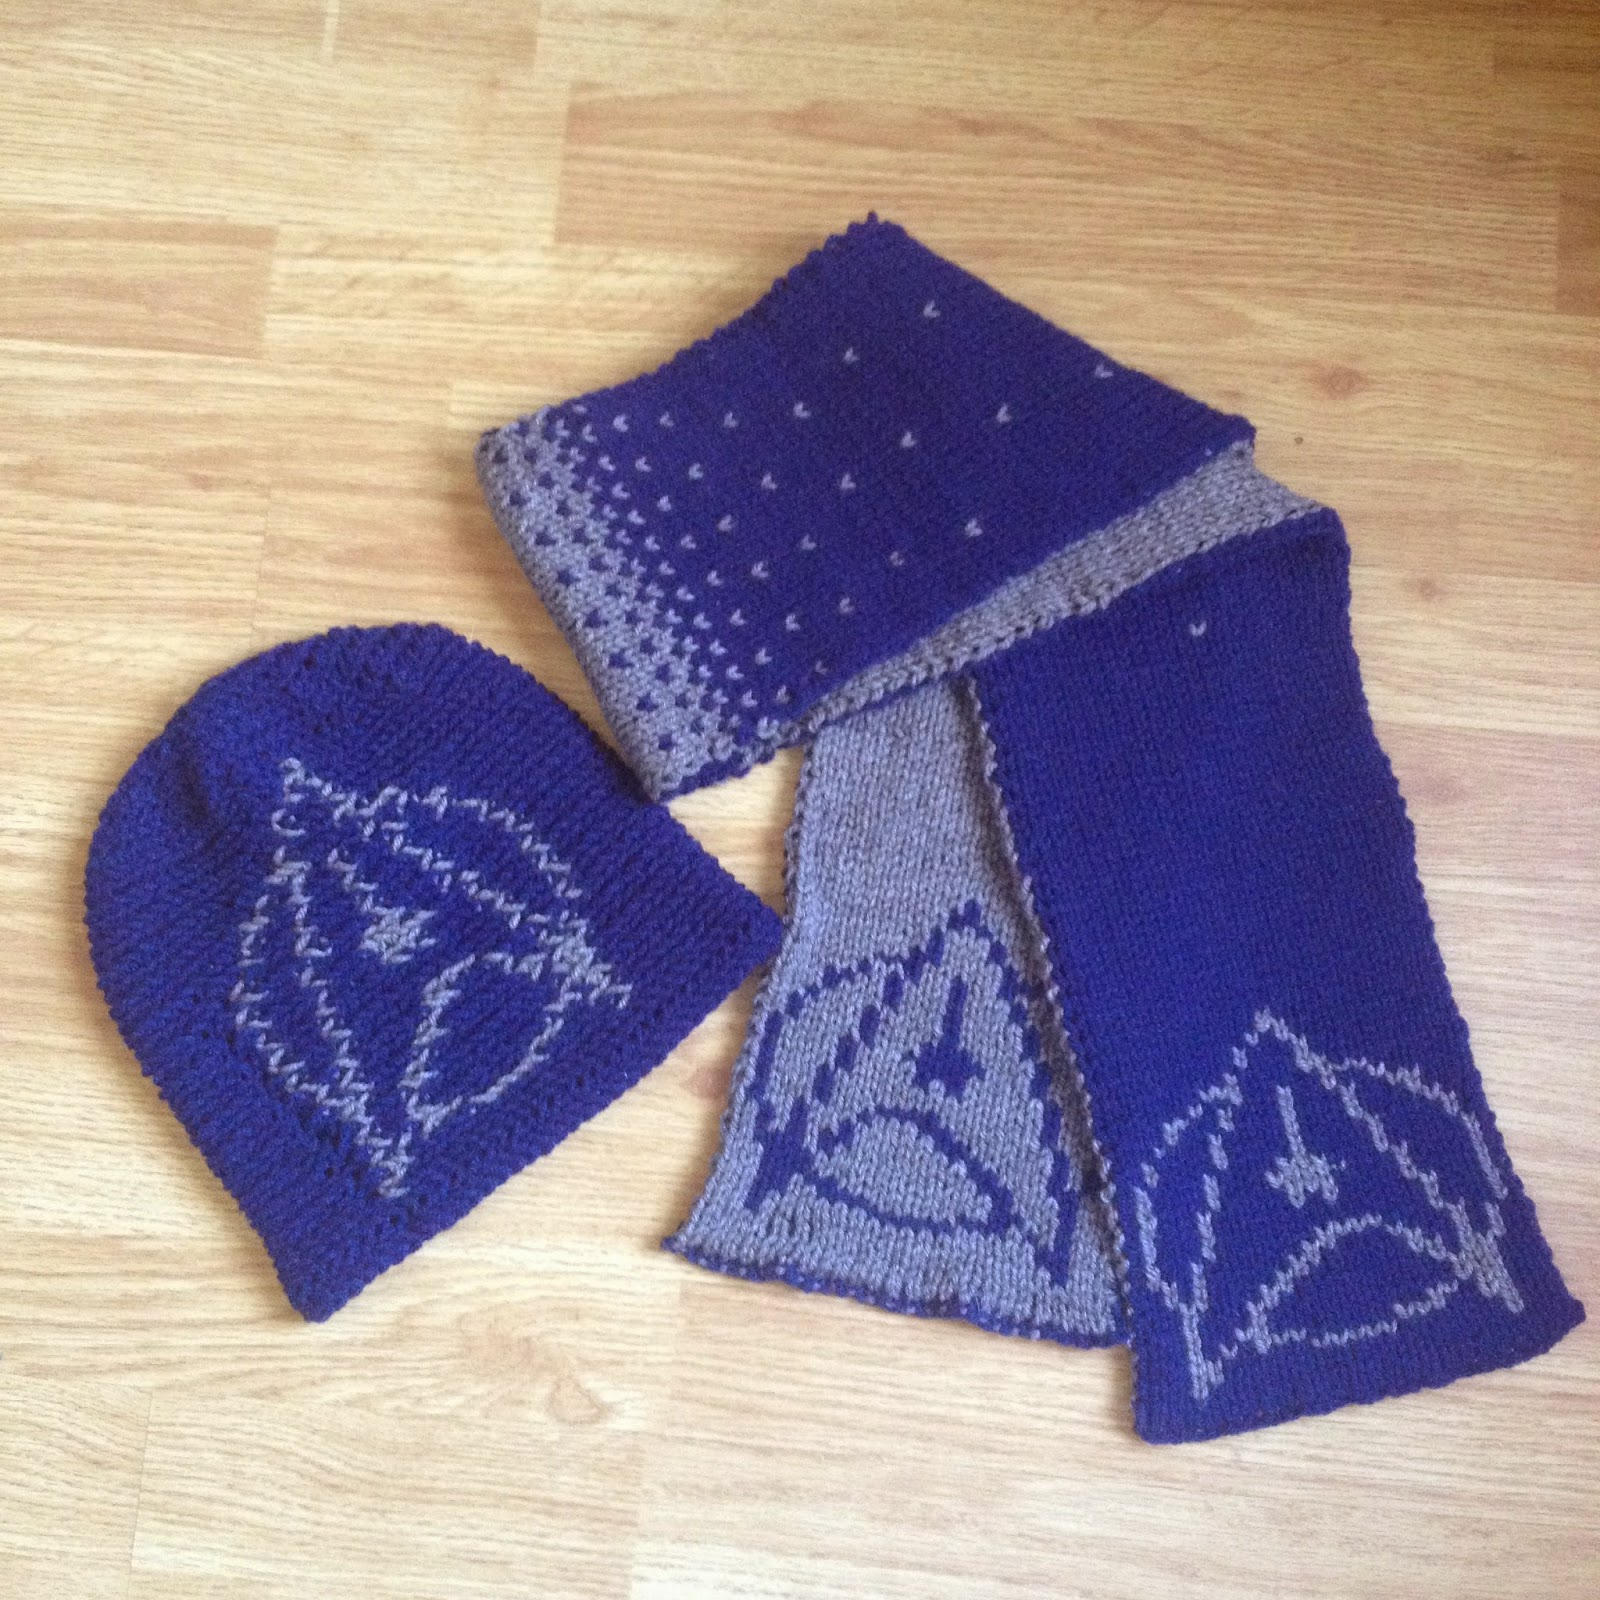 Knitting Patterns Hat Scarf Combination : WoollyRhinoCrafts: Star Trek Starfleet Insignia Hat ...